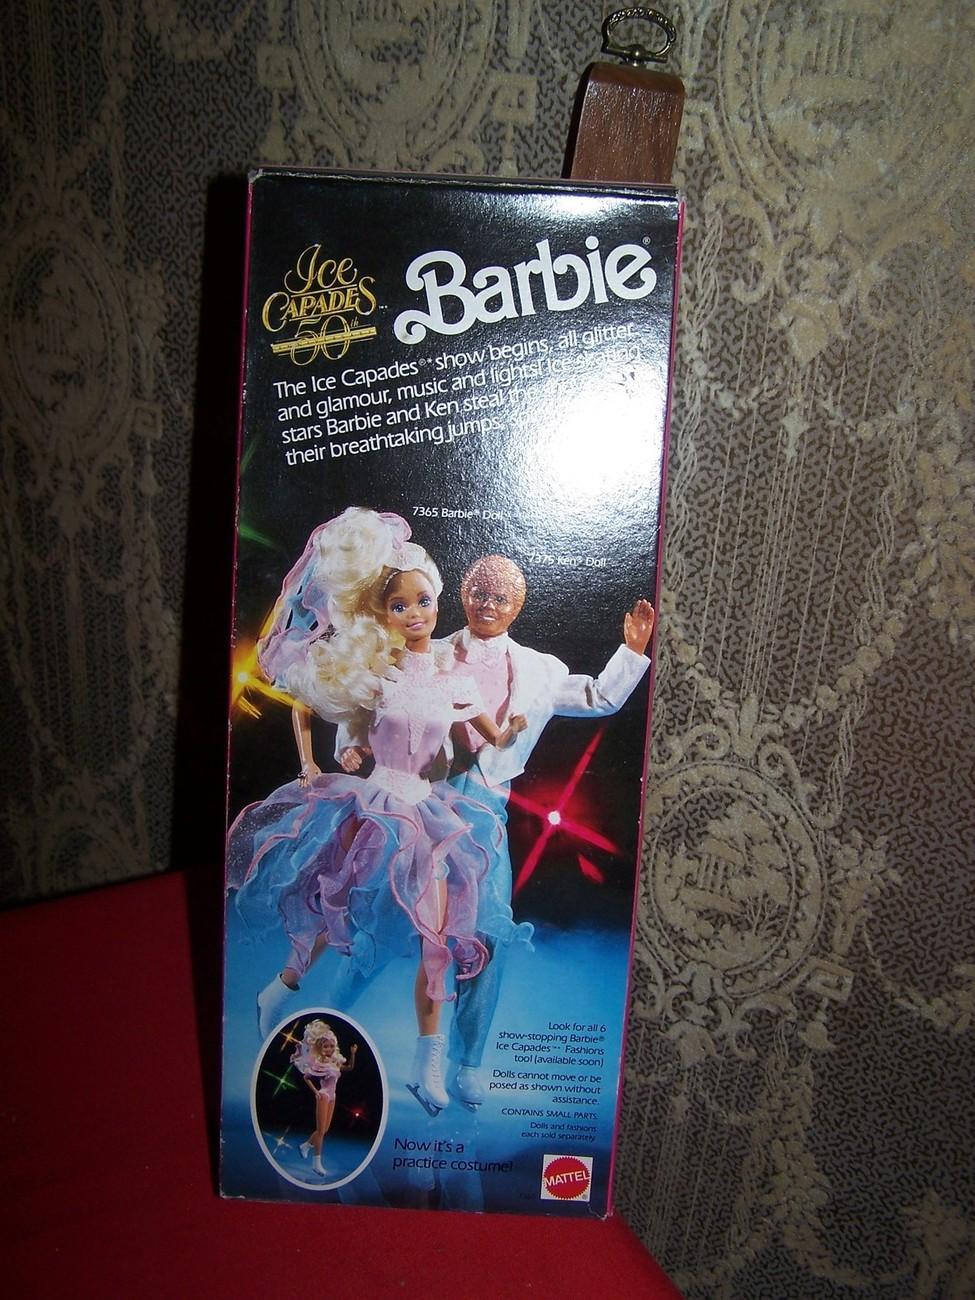 1989 Ice Capades BARBIE New in box